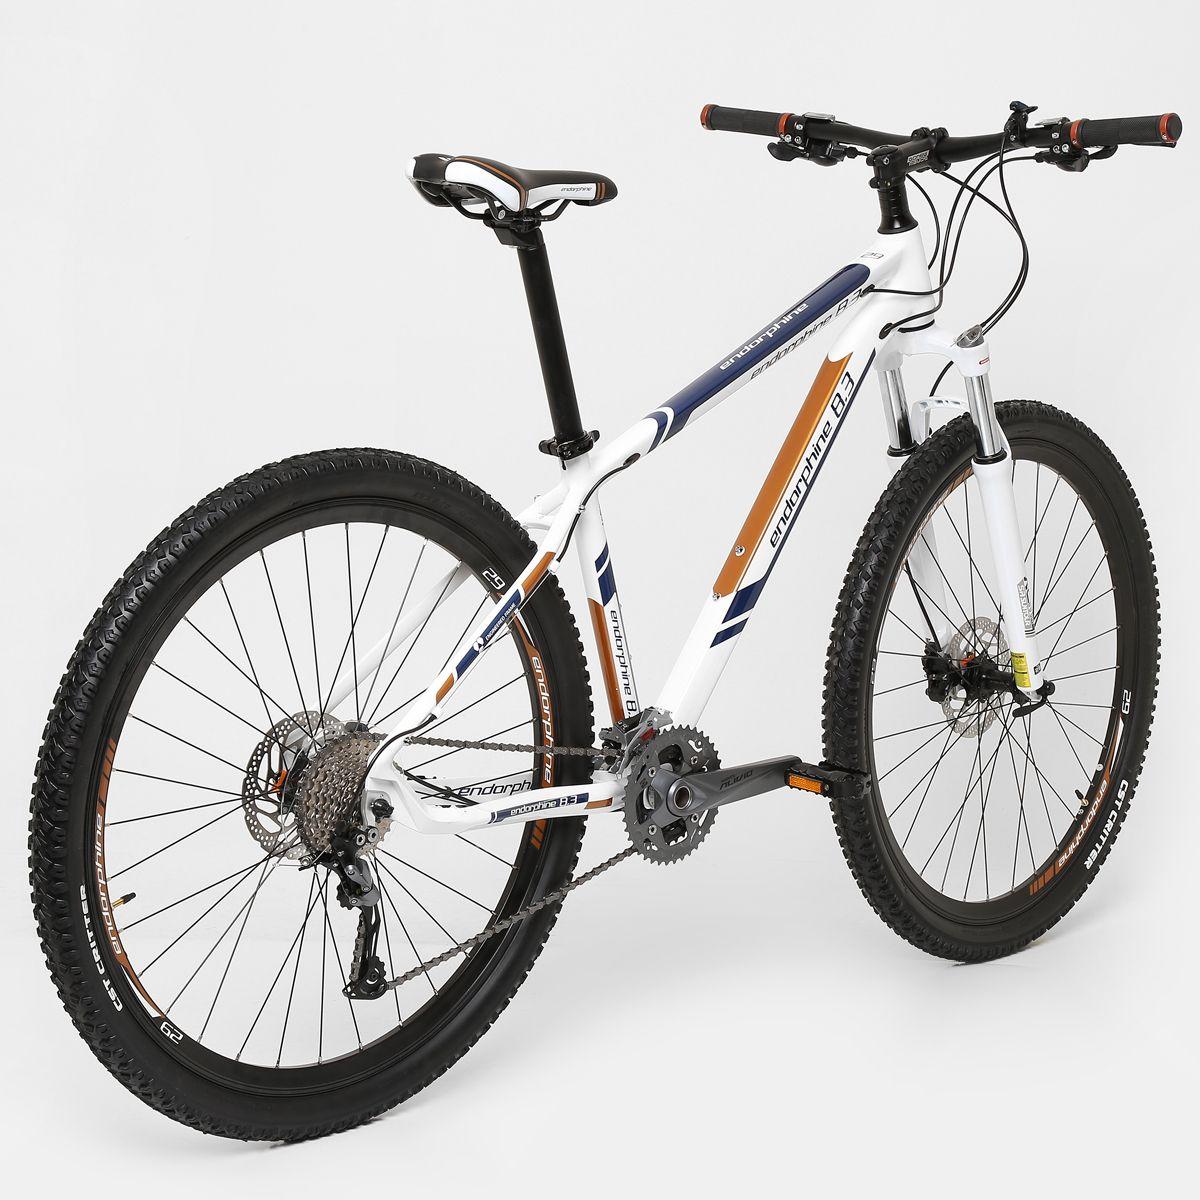 Bicicleta GONEW Endorphine 8.3 - Aro 29 - Shimano 27 ...